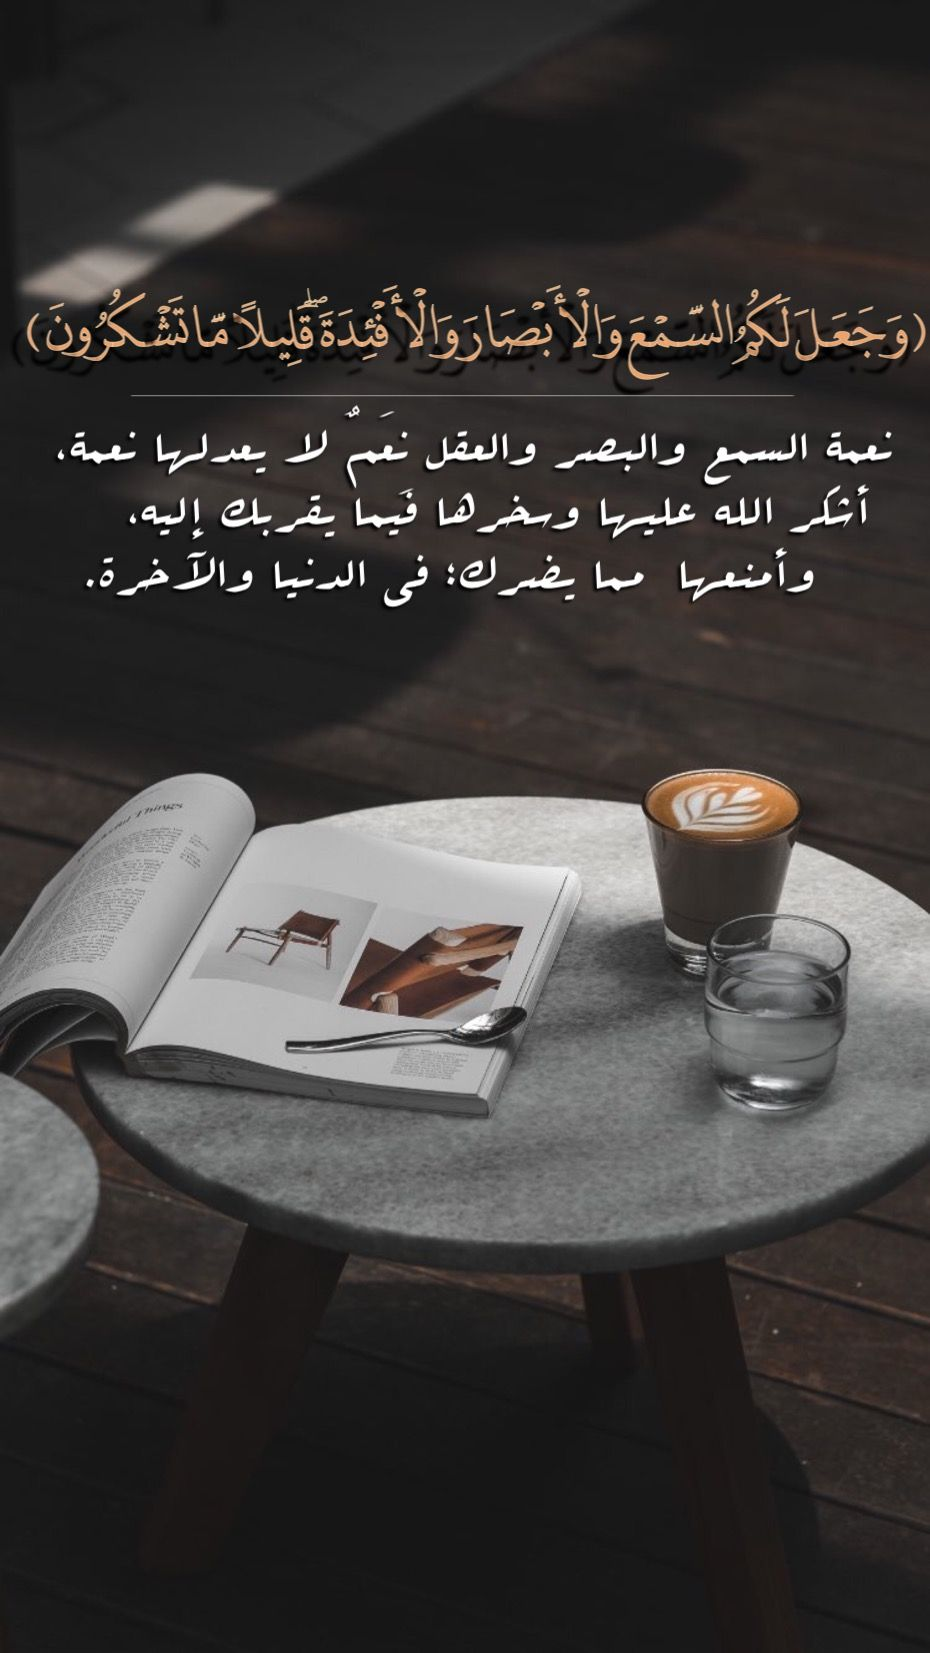 ونعم بالله Beautiful Words Islam Dream Decor